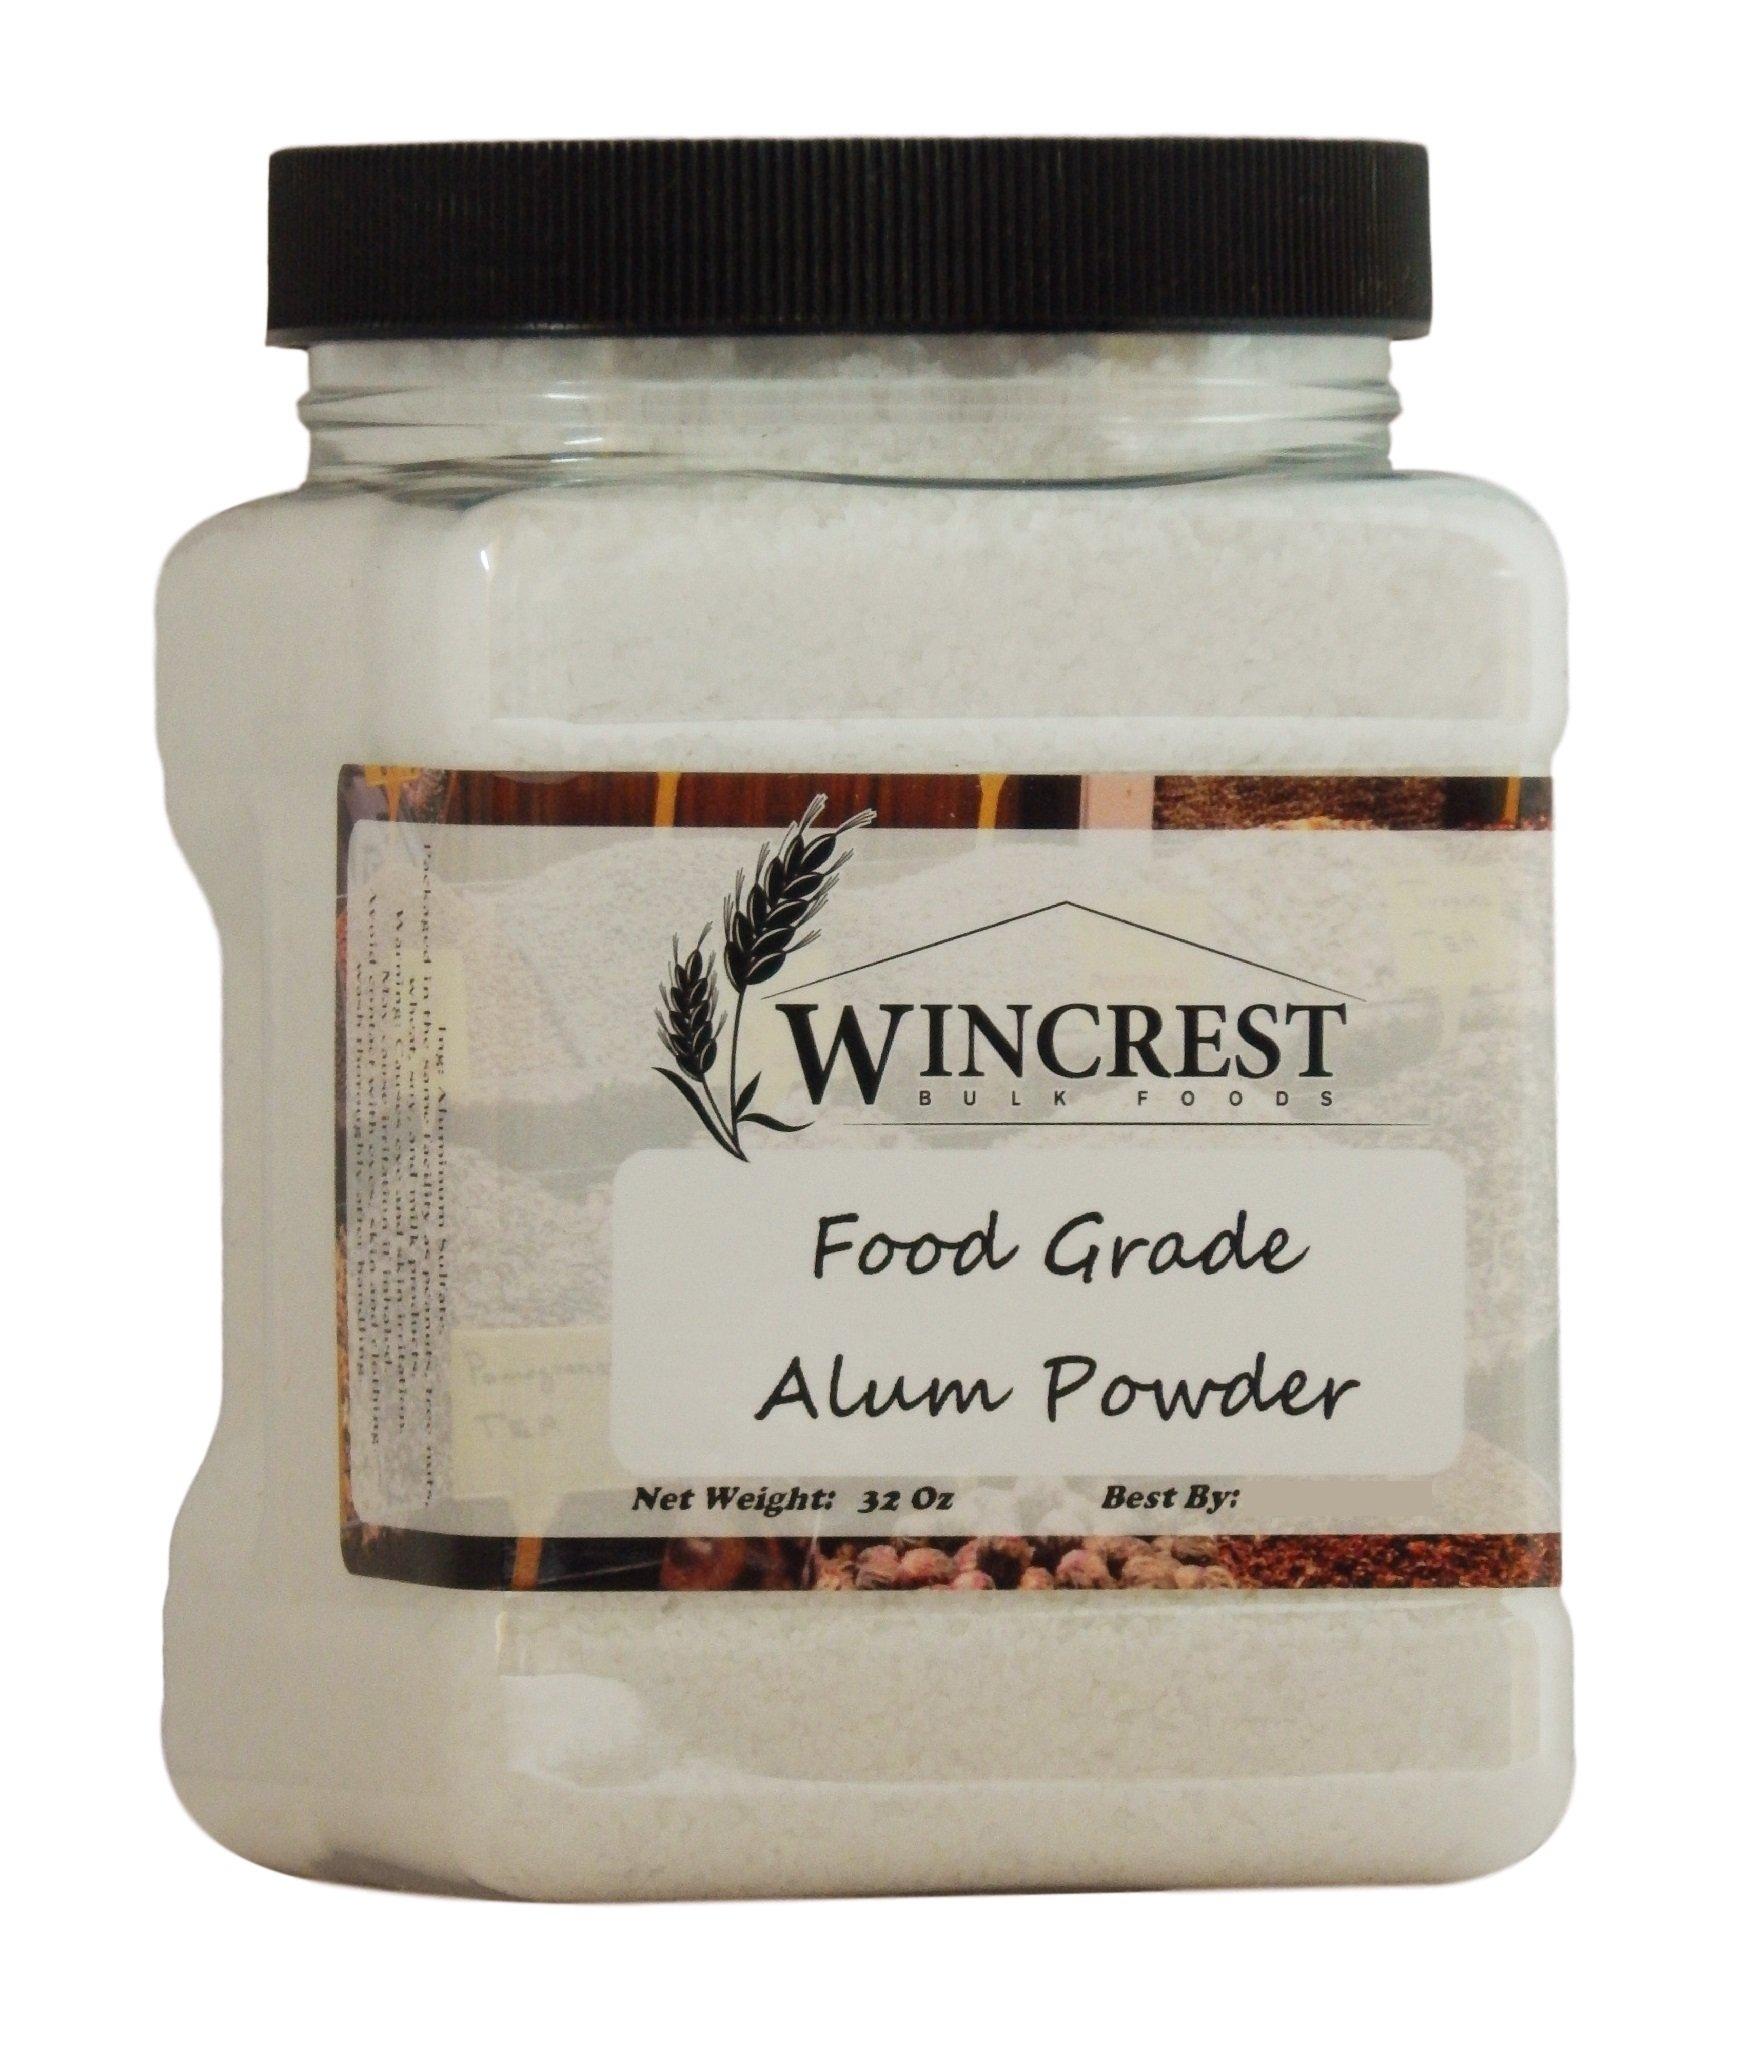 Alum Powder - Food Grade - 2 Lb Container